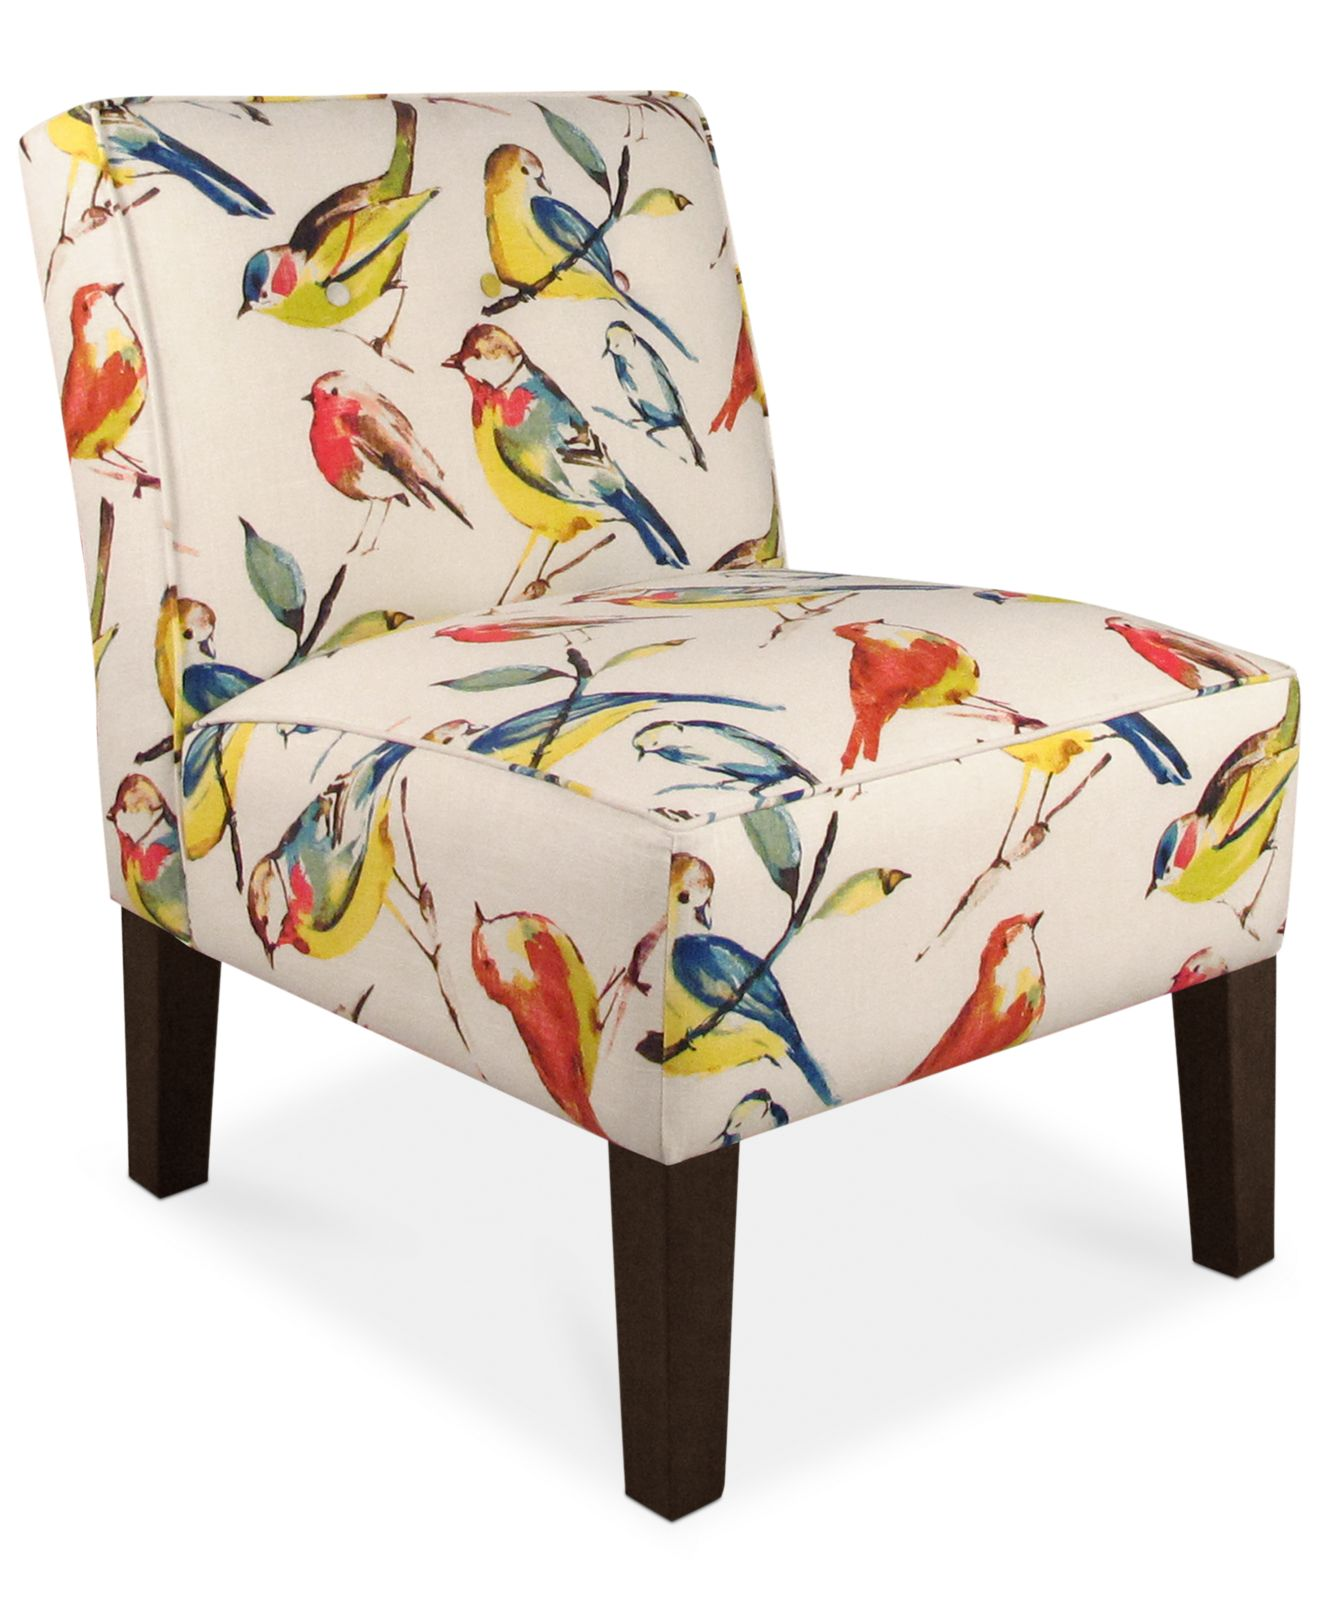 Bird Fabric Chair Calabasas Bird Watcher Fabric